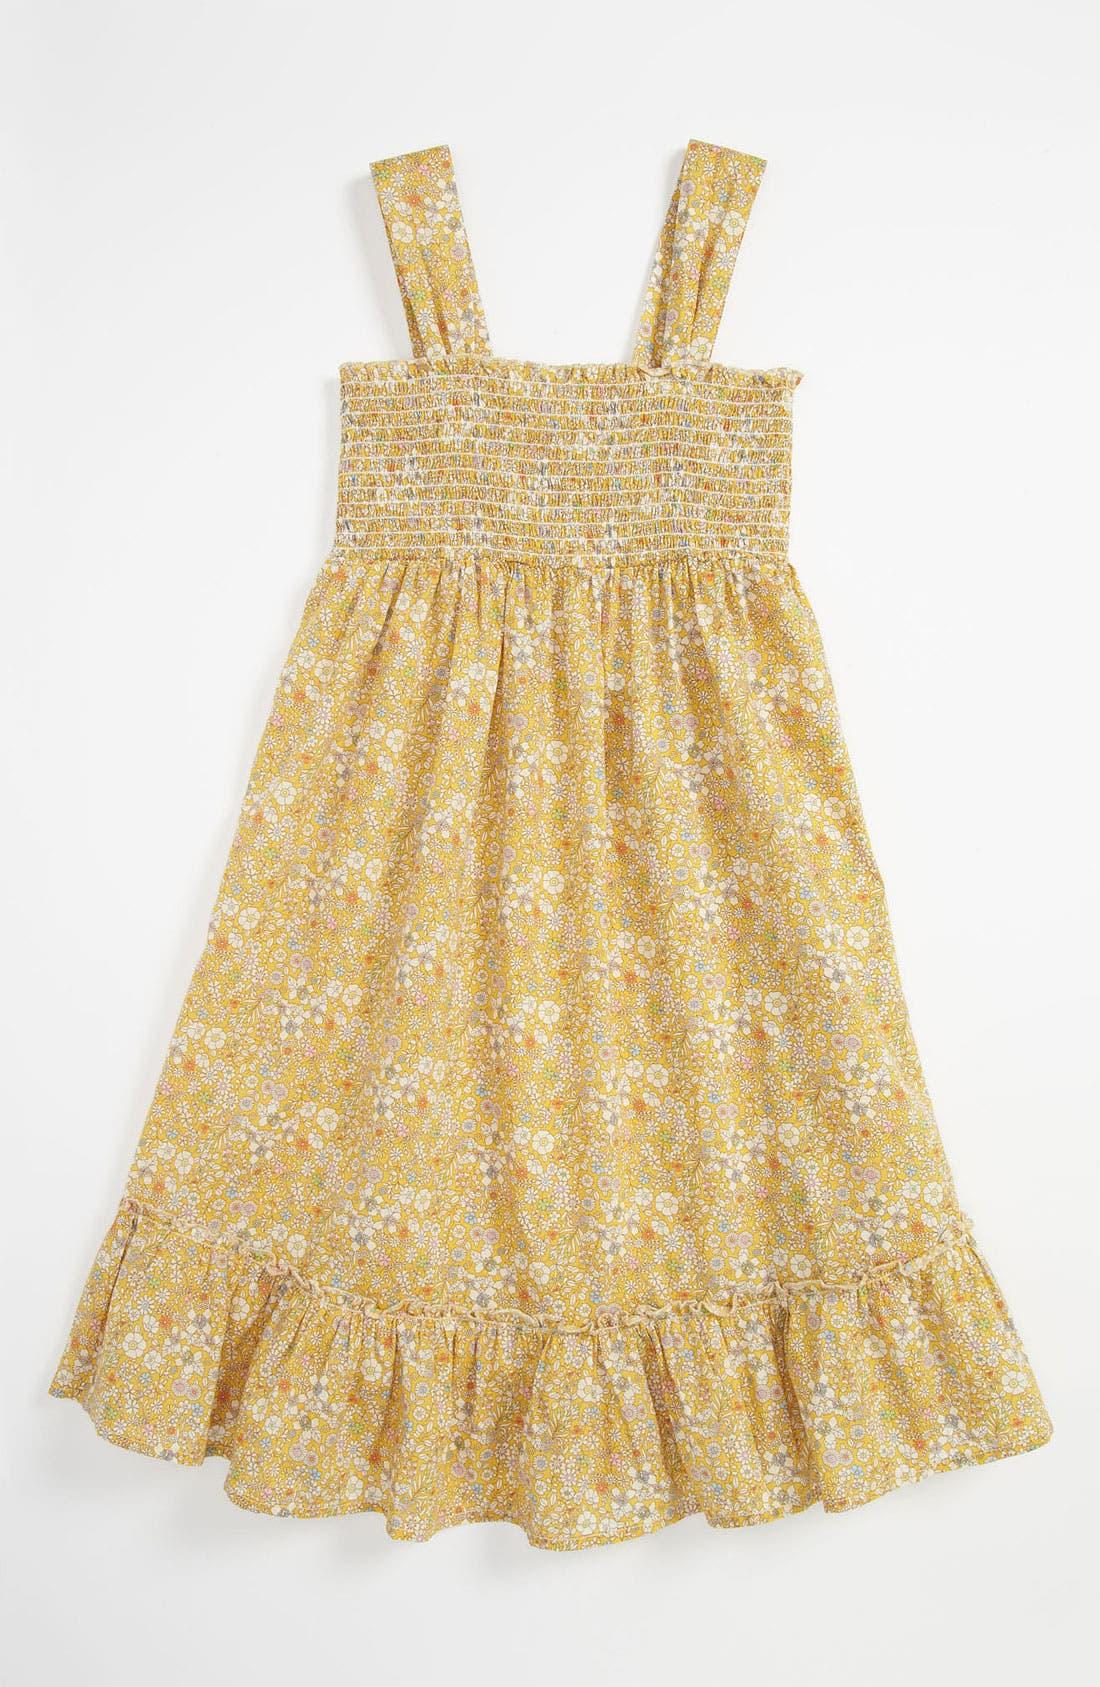 Alternate Image 1 Selected - Peek 'Daisy' Dress (Big Girls)